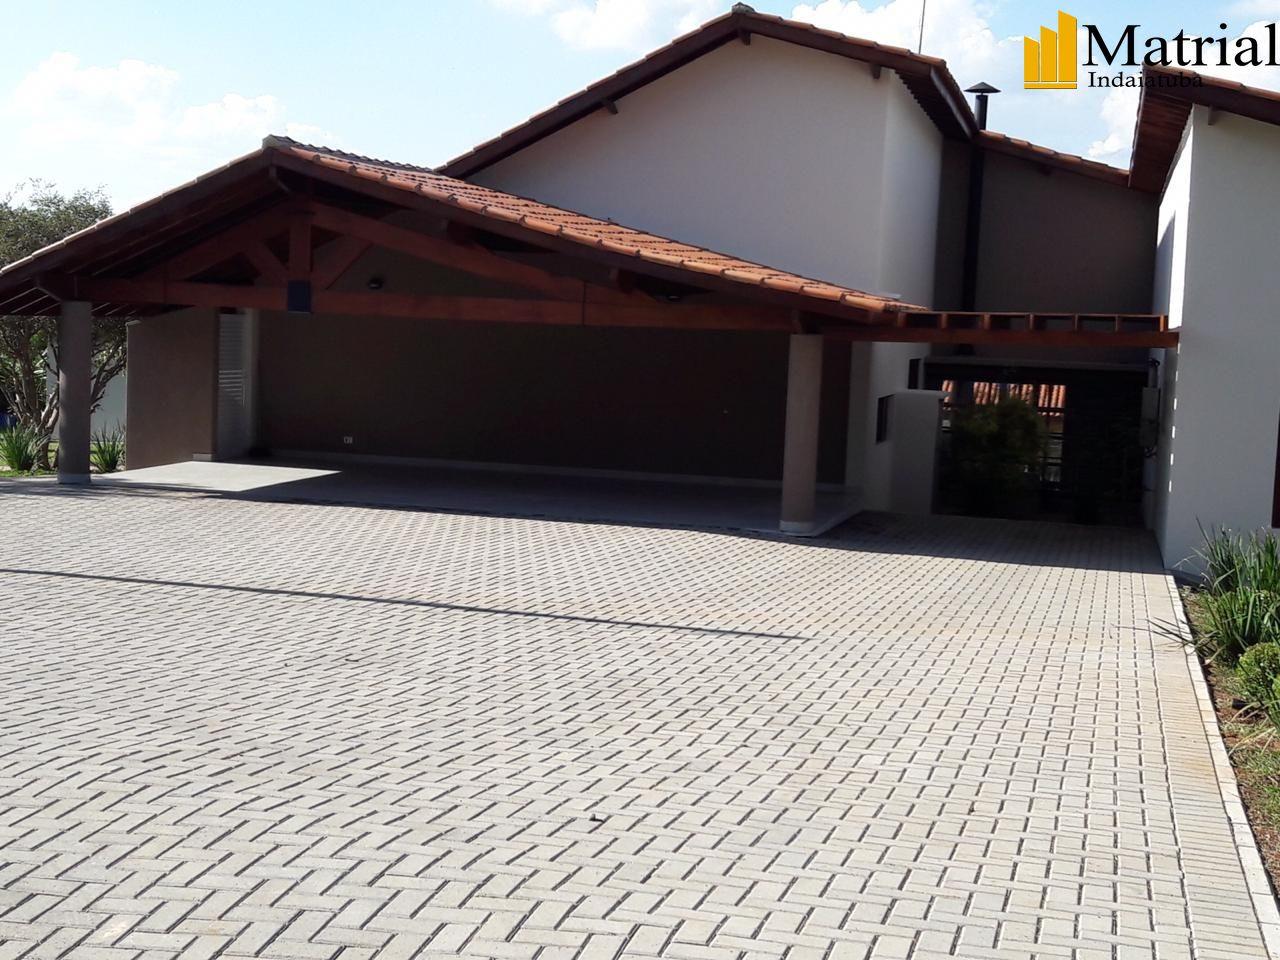 Casa à venda  no Condomínio Fechado Village Haras São Luiz II - Salto, SP. Imóveis